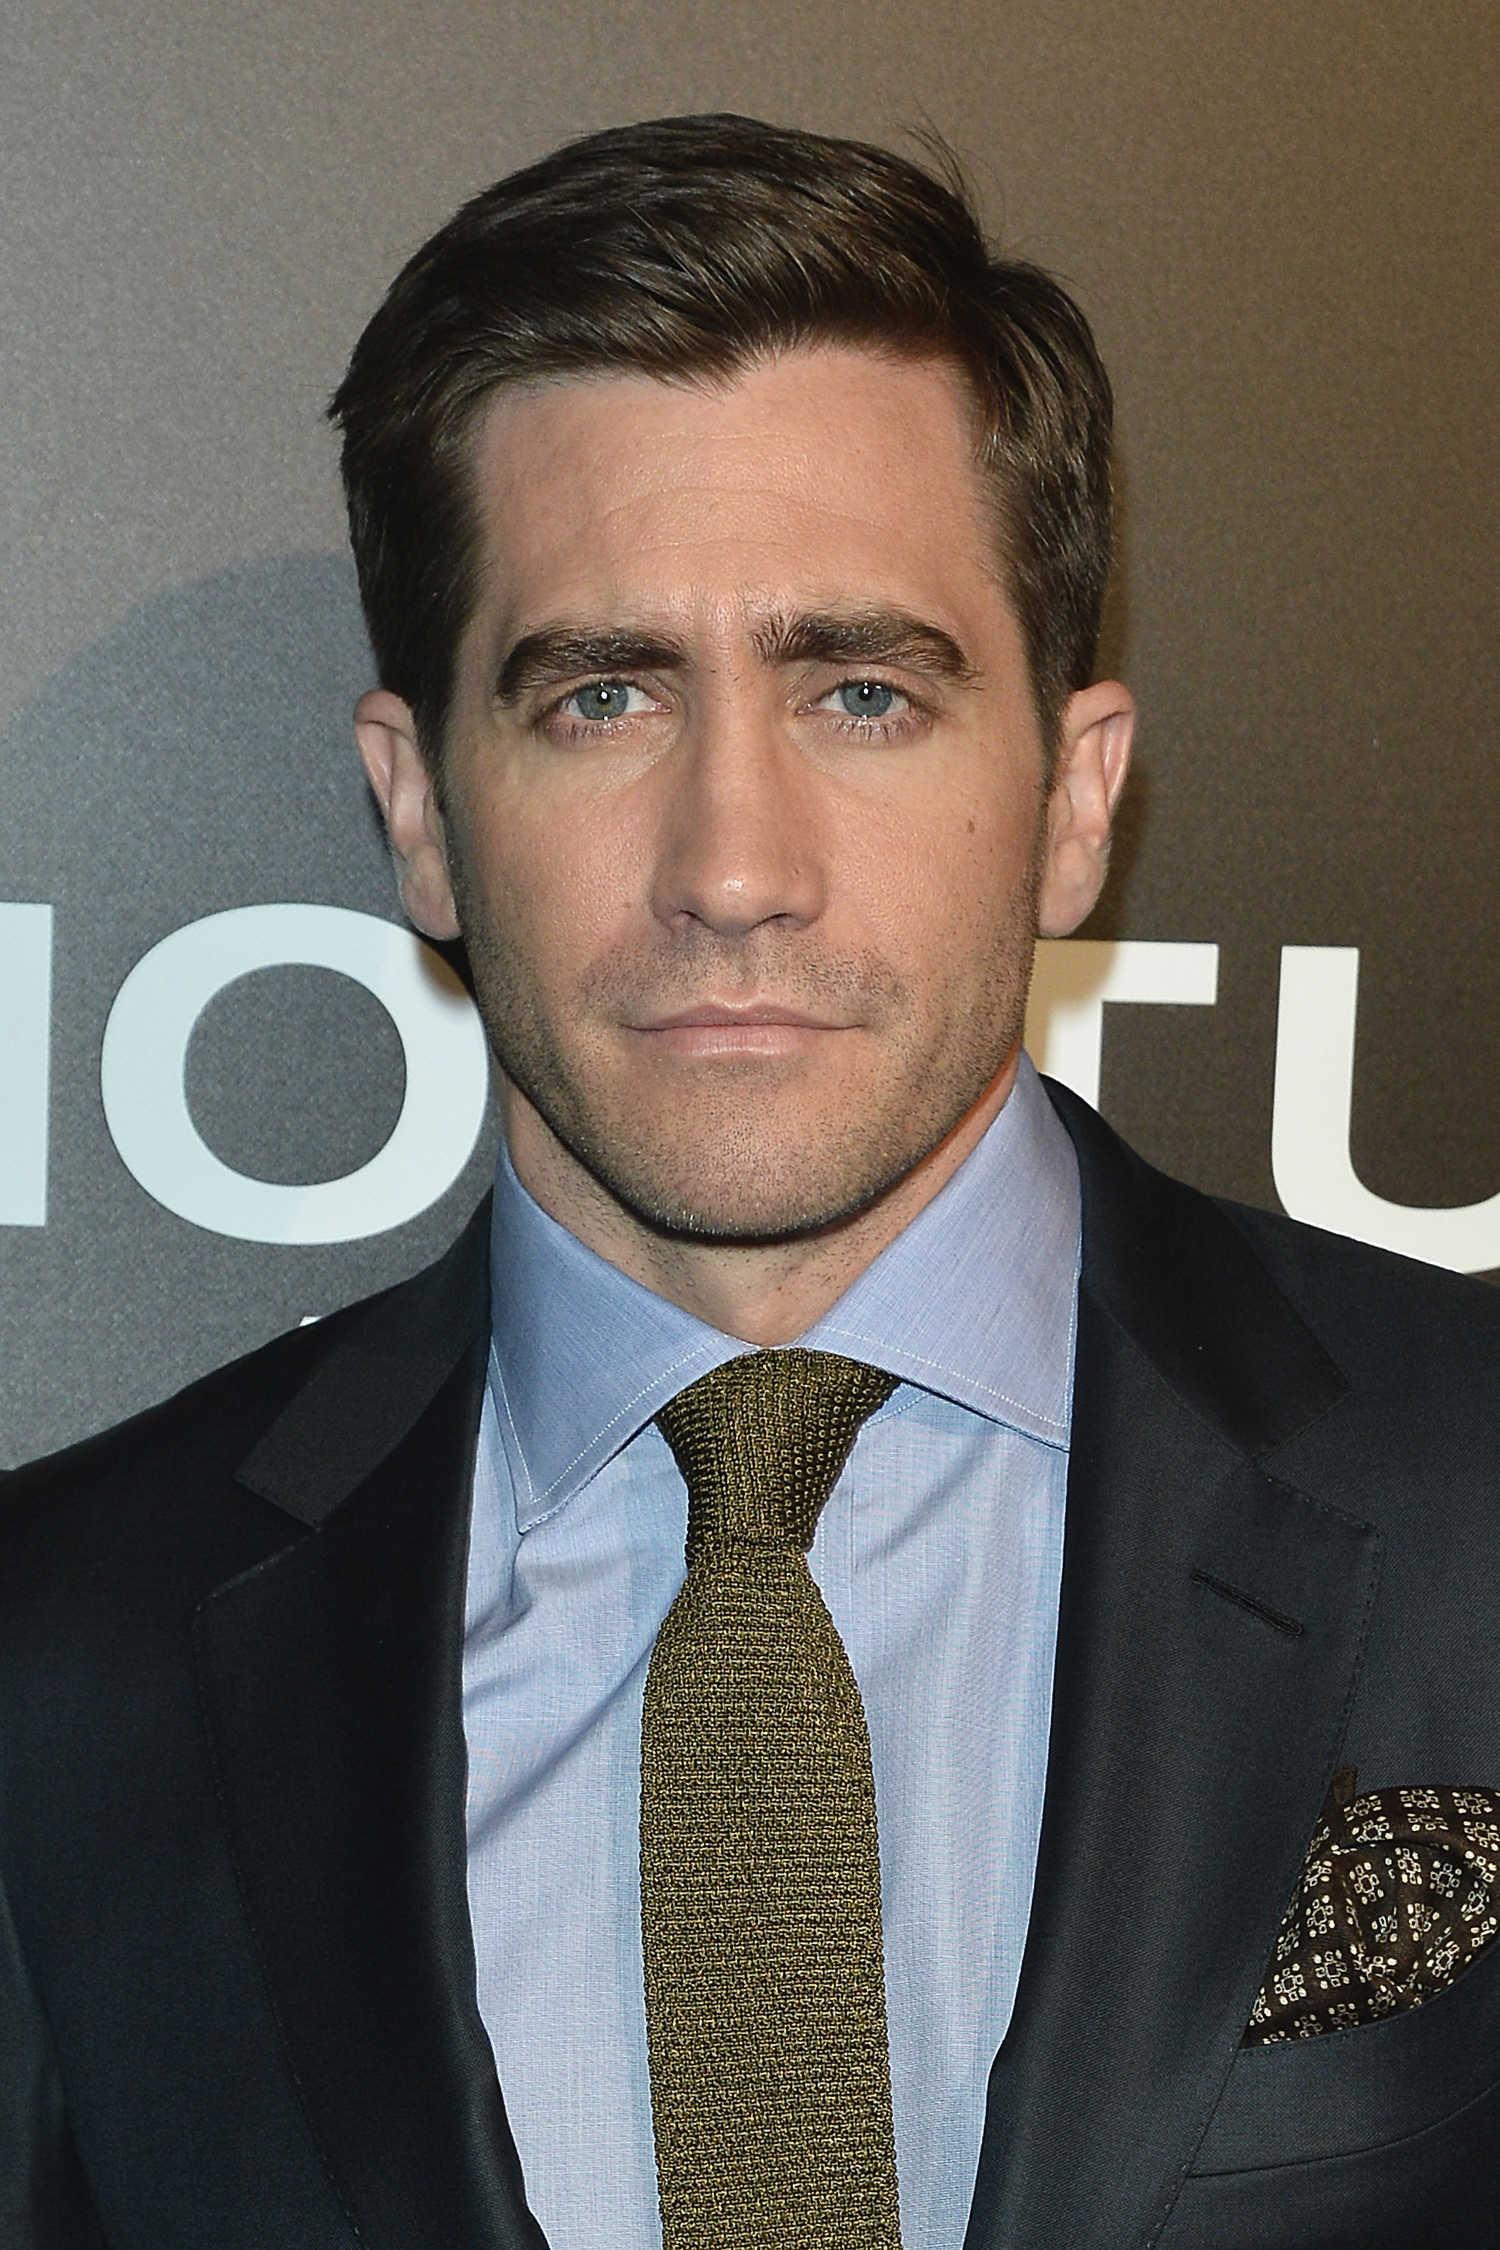 Jake Gyllenhaal at the Nocturnal Animals Screening in ... Jake Gyllenhaal